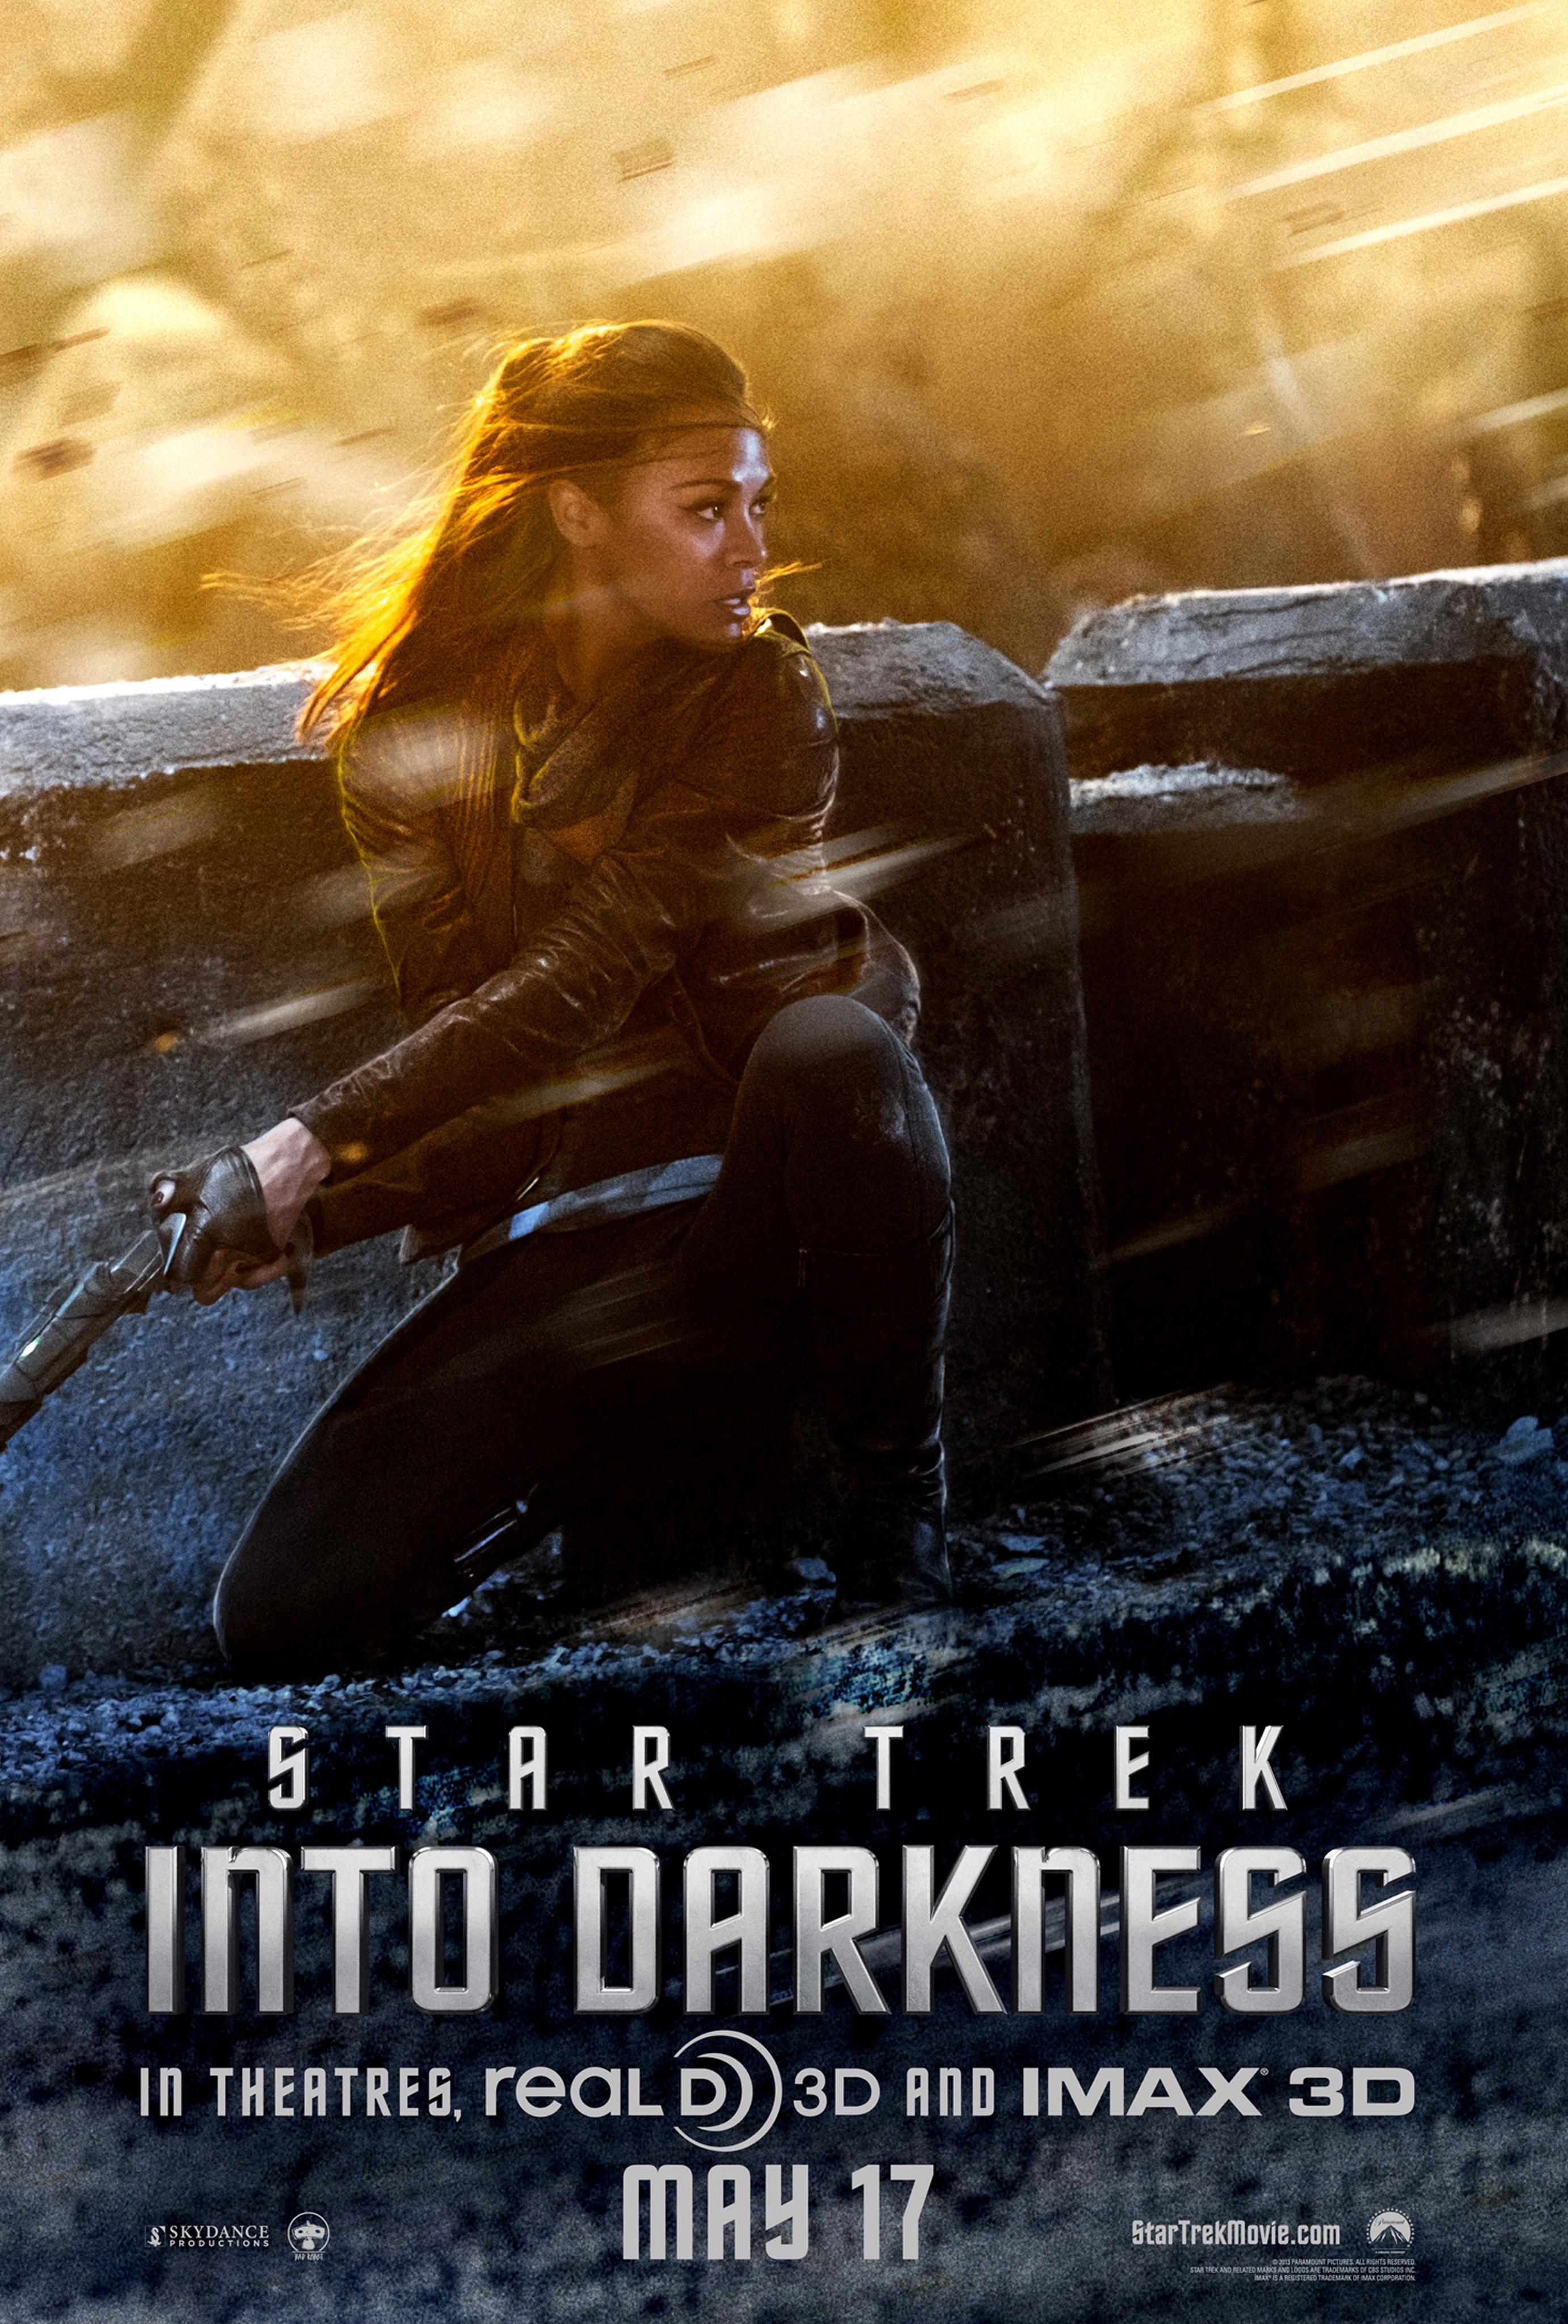 Star Trek Into Darkness - Movie Poster #2 (Original)